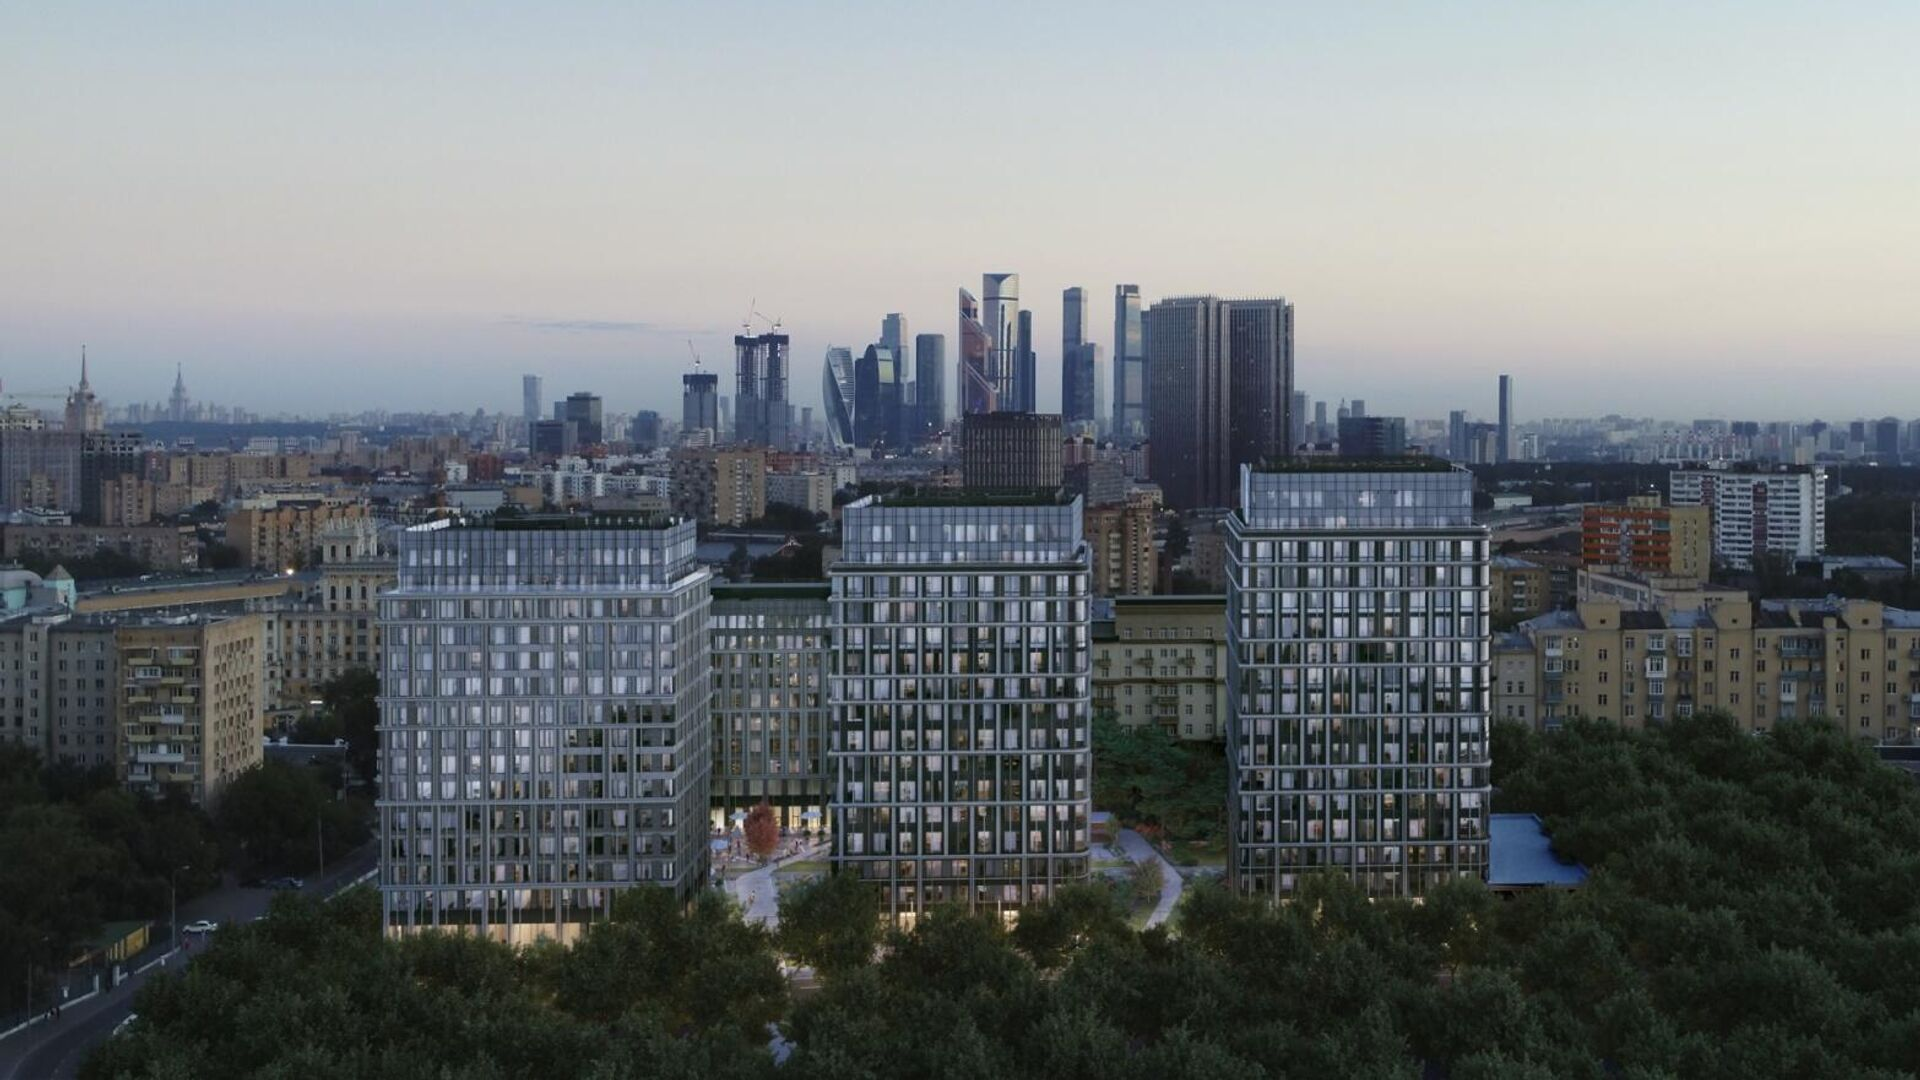 Проект комплекса на месте завода Слава в Москве - РИА Новости, 1920, 04.11.2020